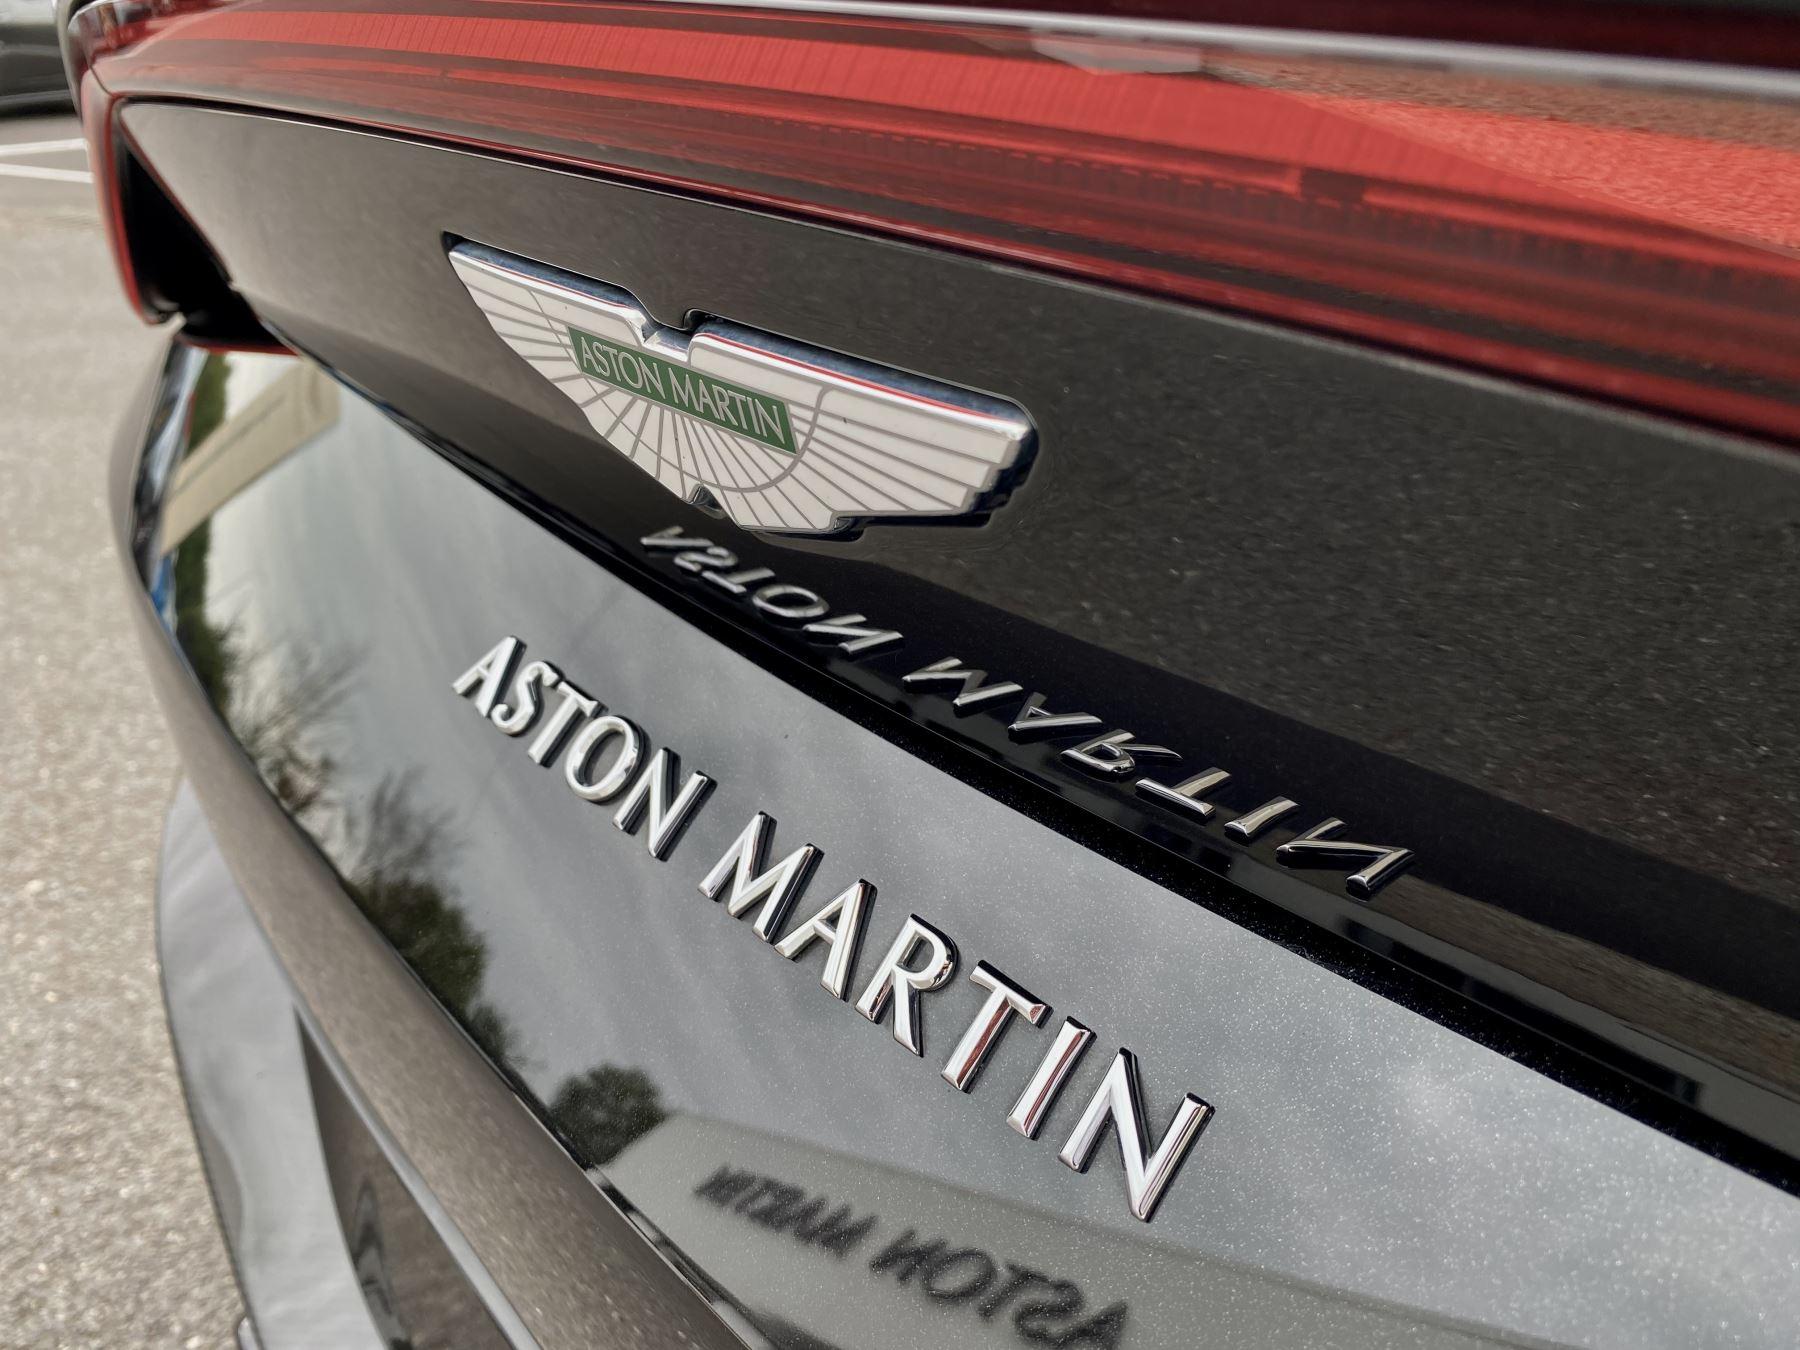 Aston Martin New Vantage 2dr ZF 8 Speed Auto. 4.0 Twin Turbo ZF Gearbox  Reversing Camera Heated Seats Ceramic Brakes image 15